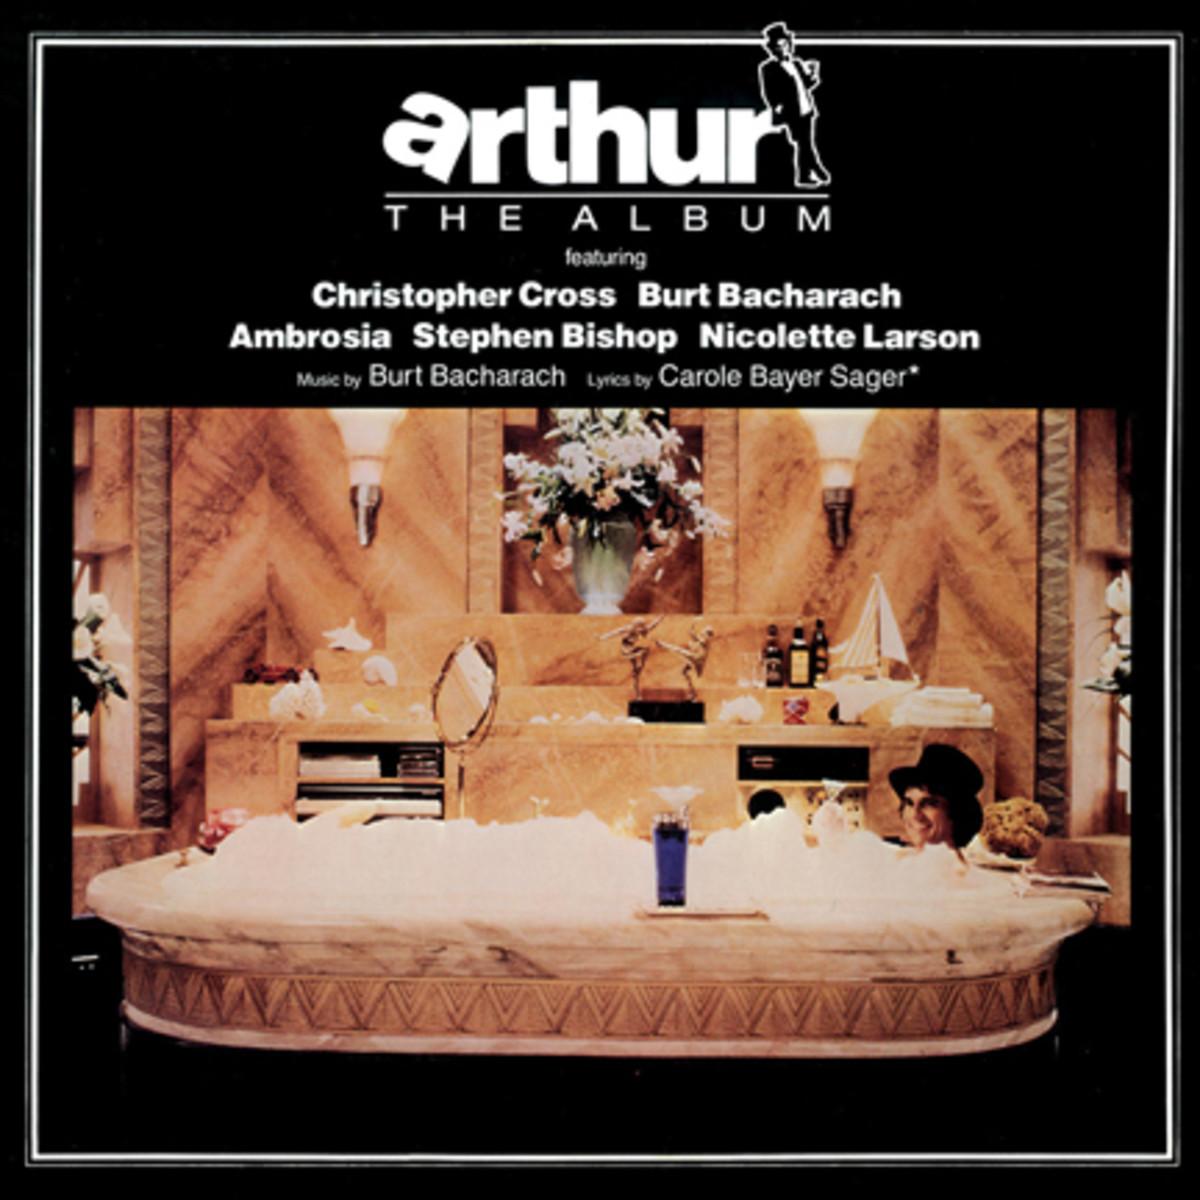 Arthur soundtrack